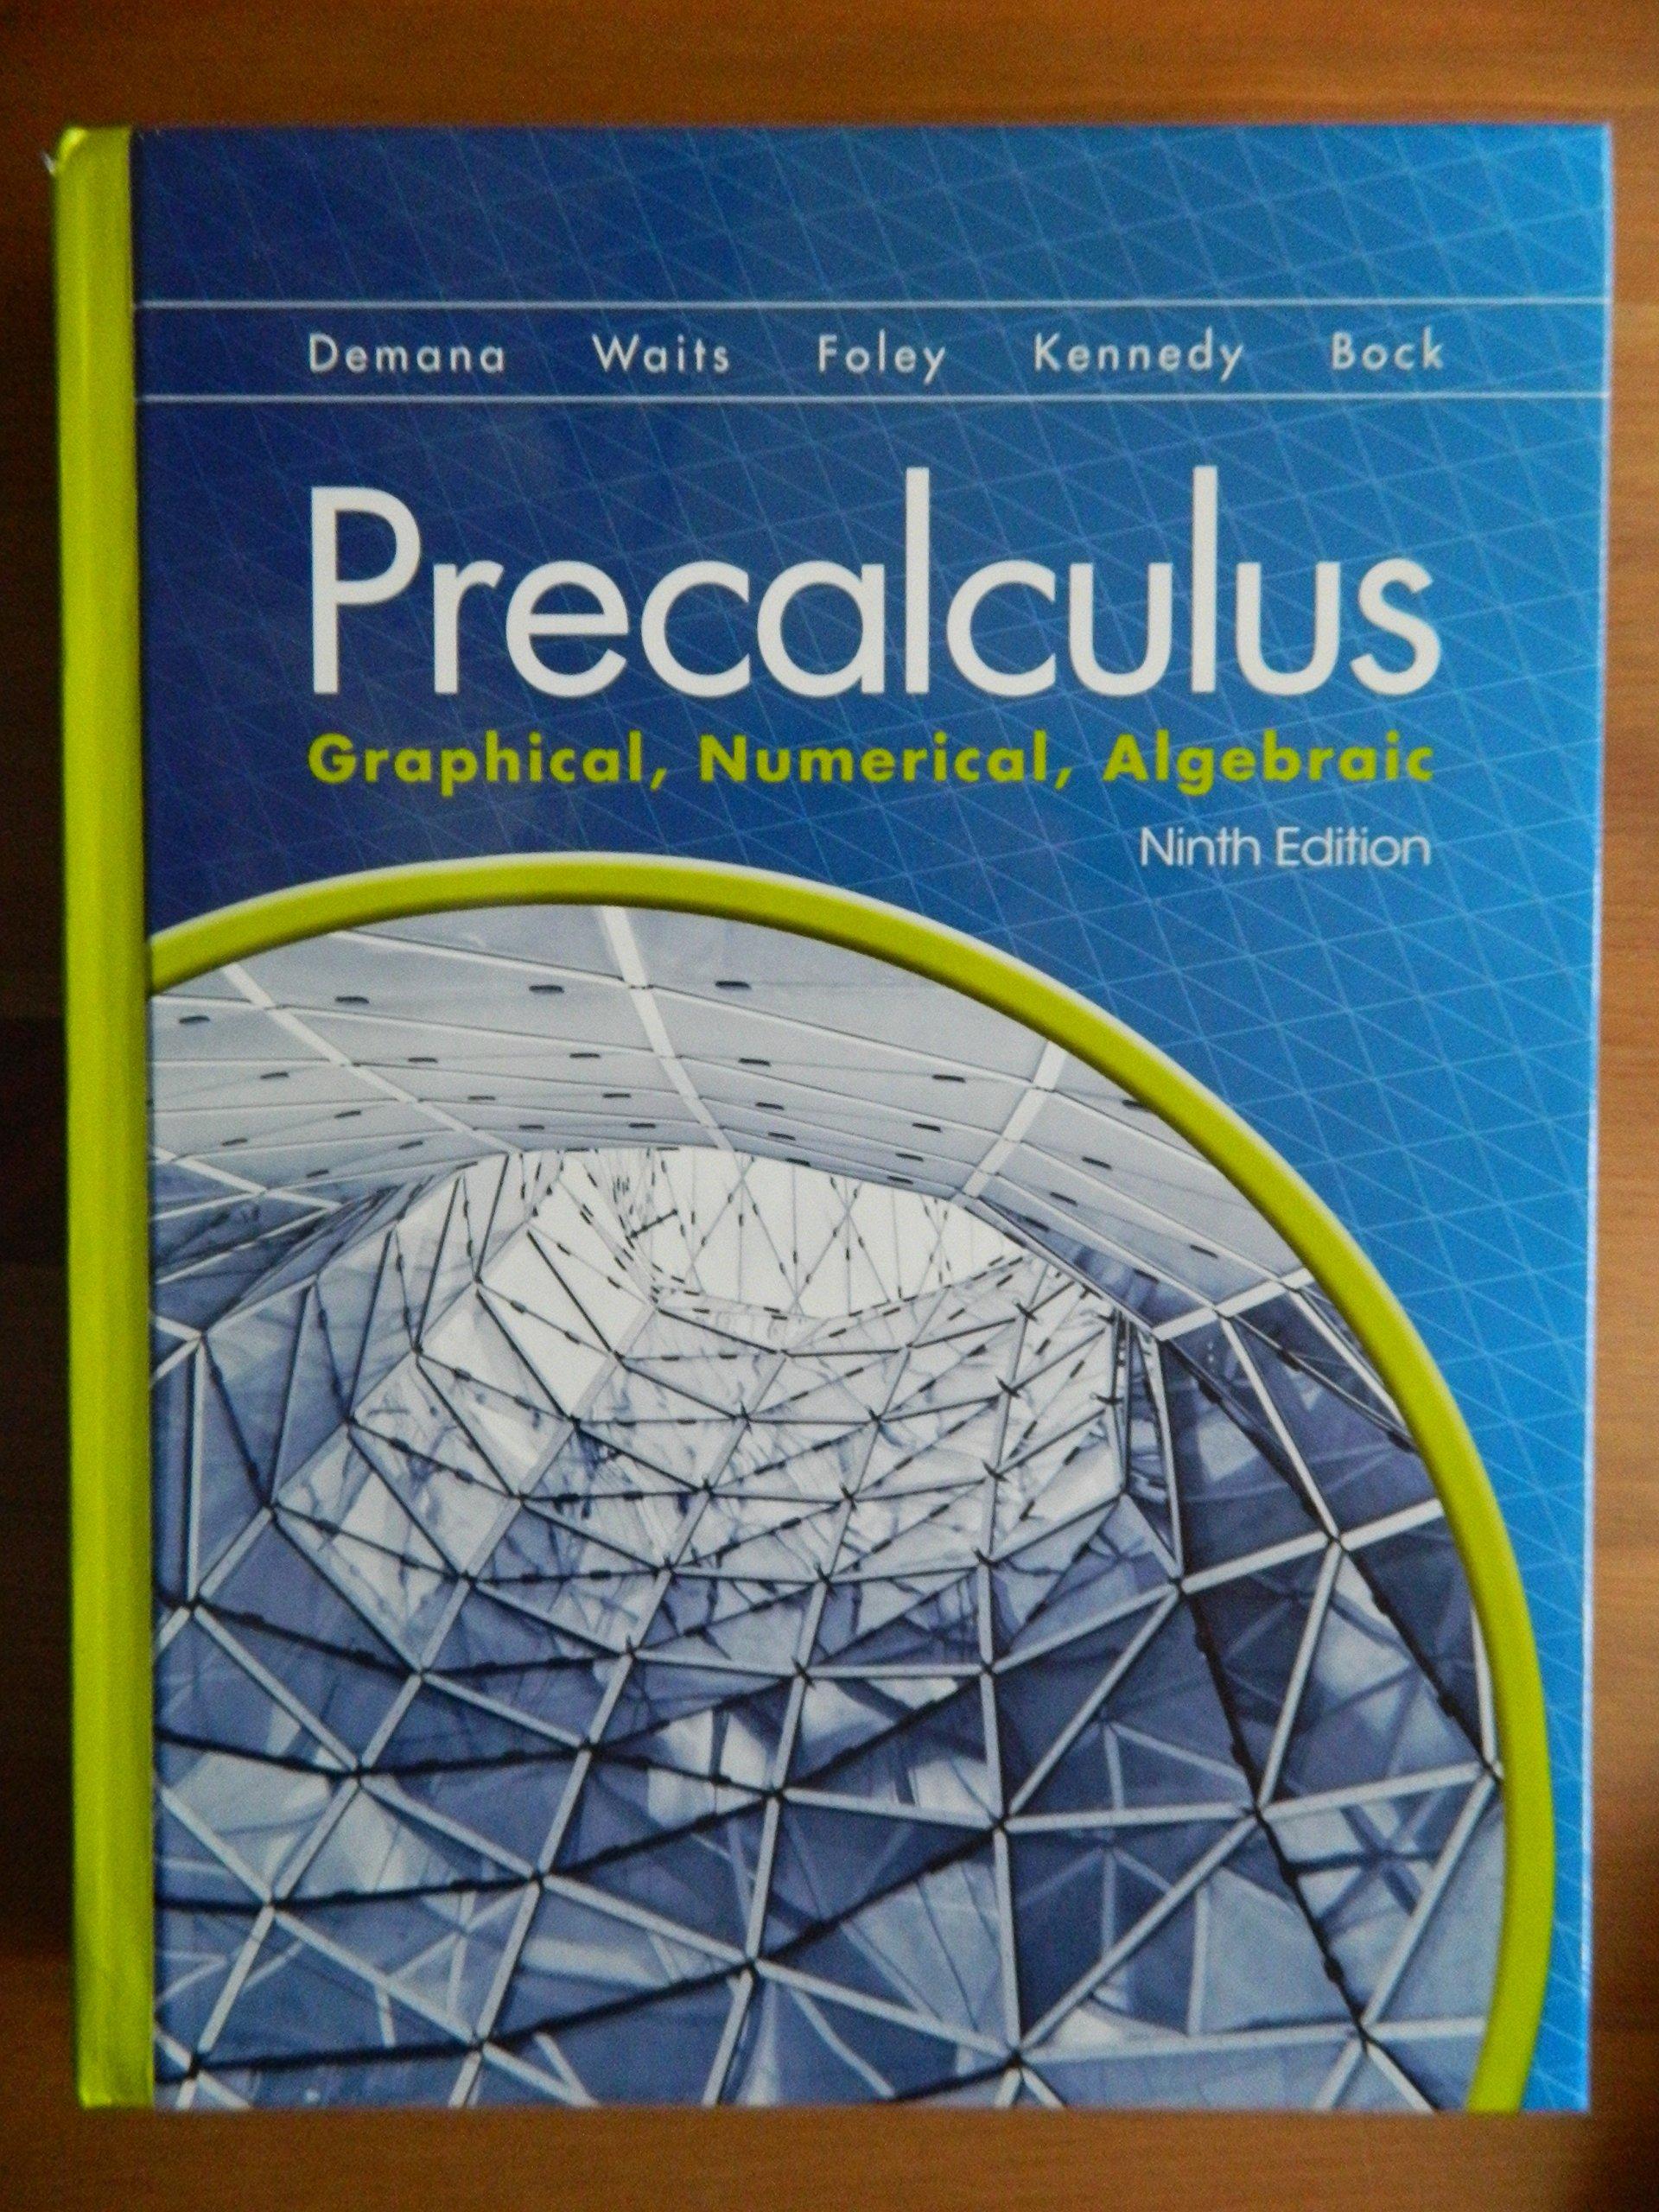 Precalculus Graphical Numerical Algebraic Homework Help